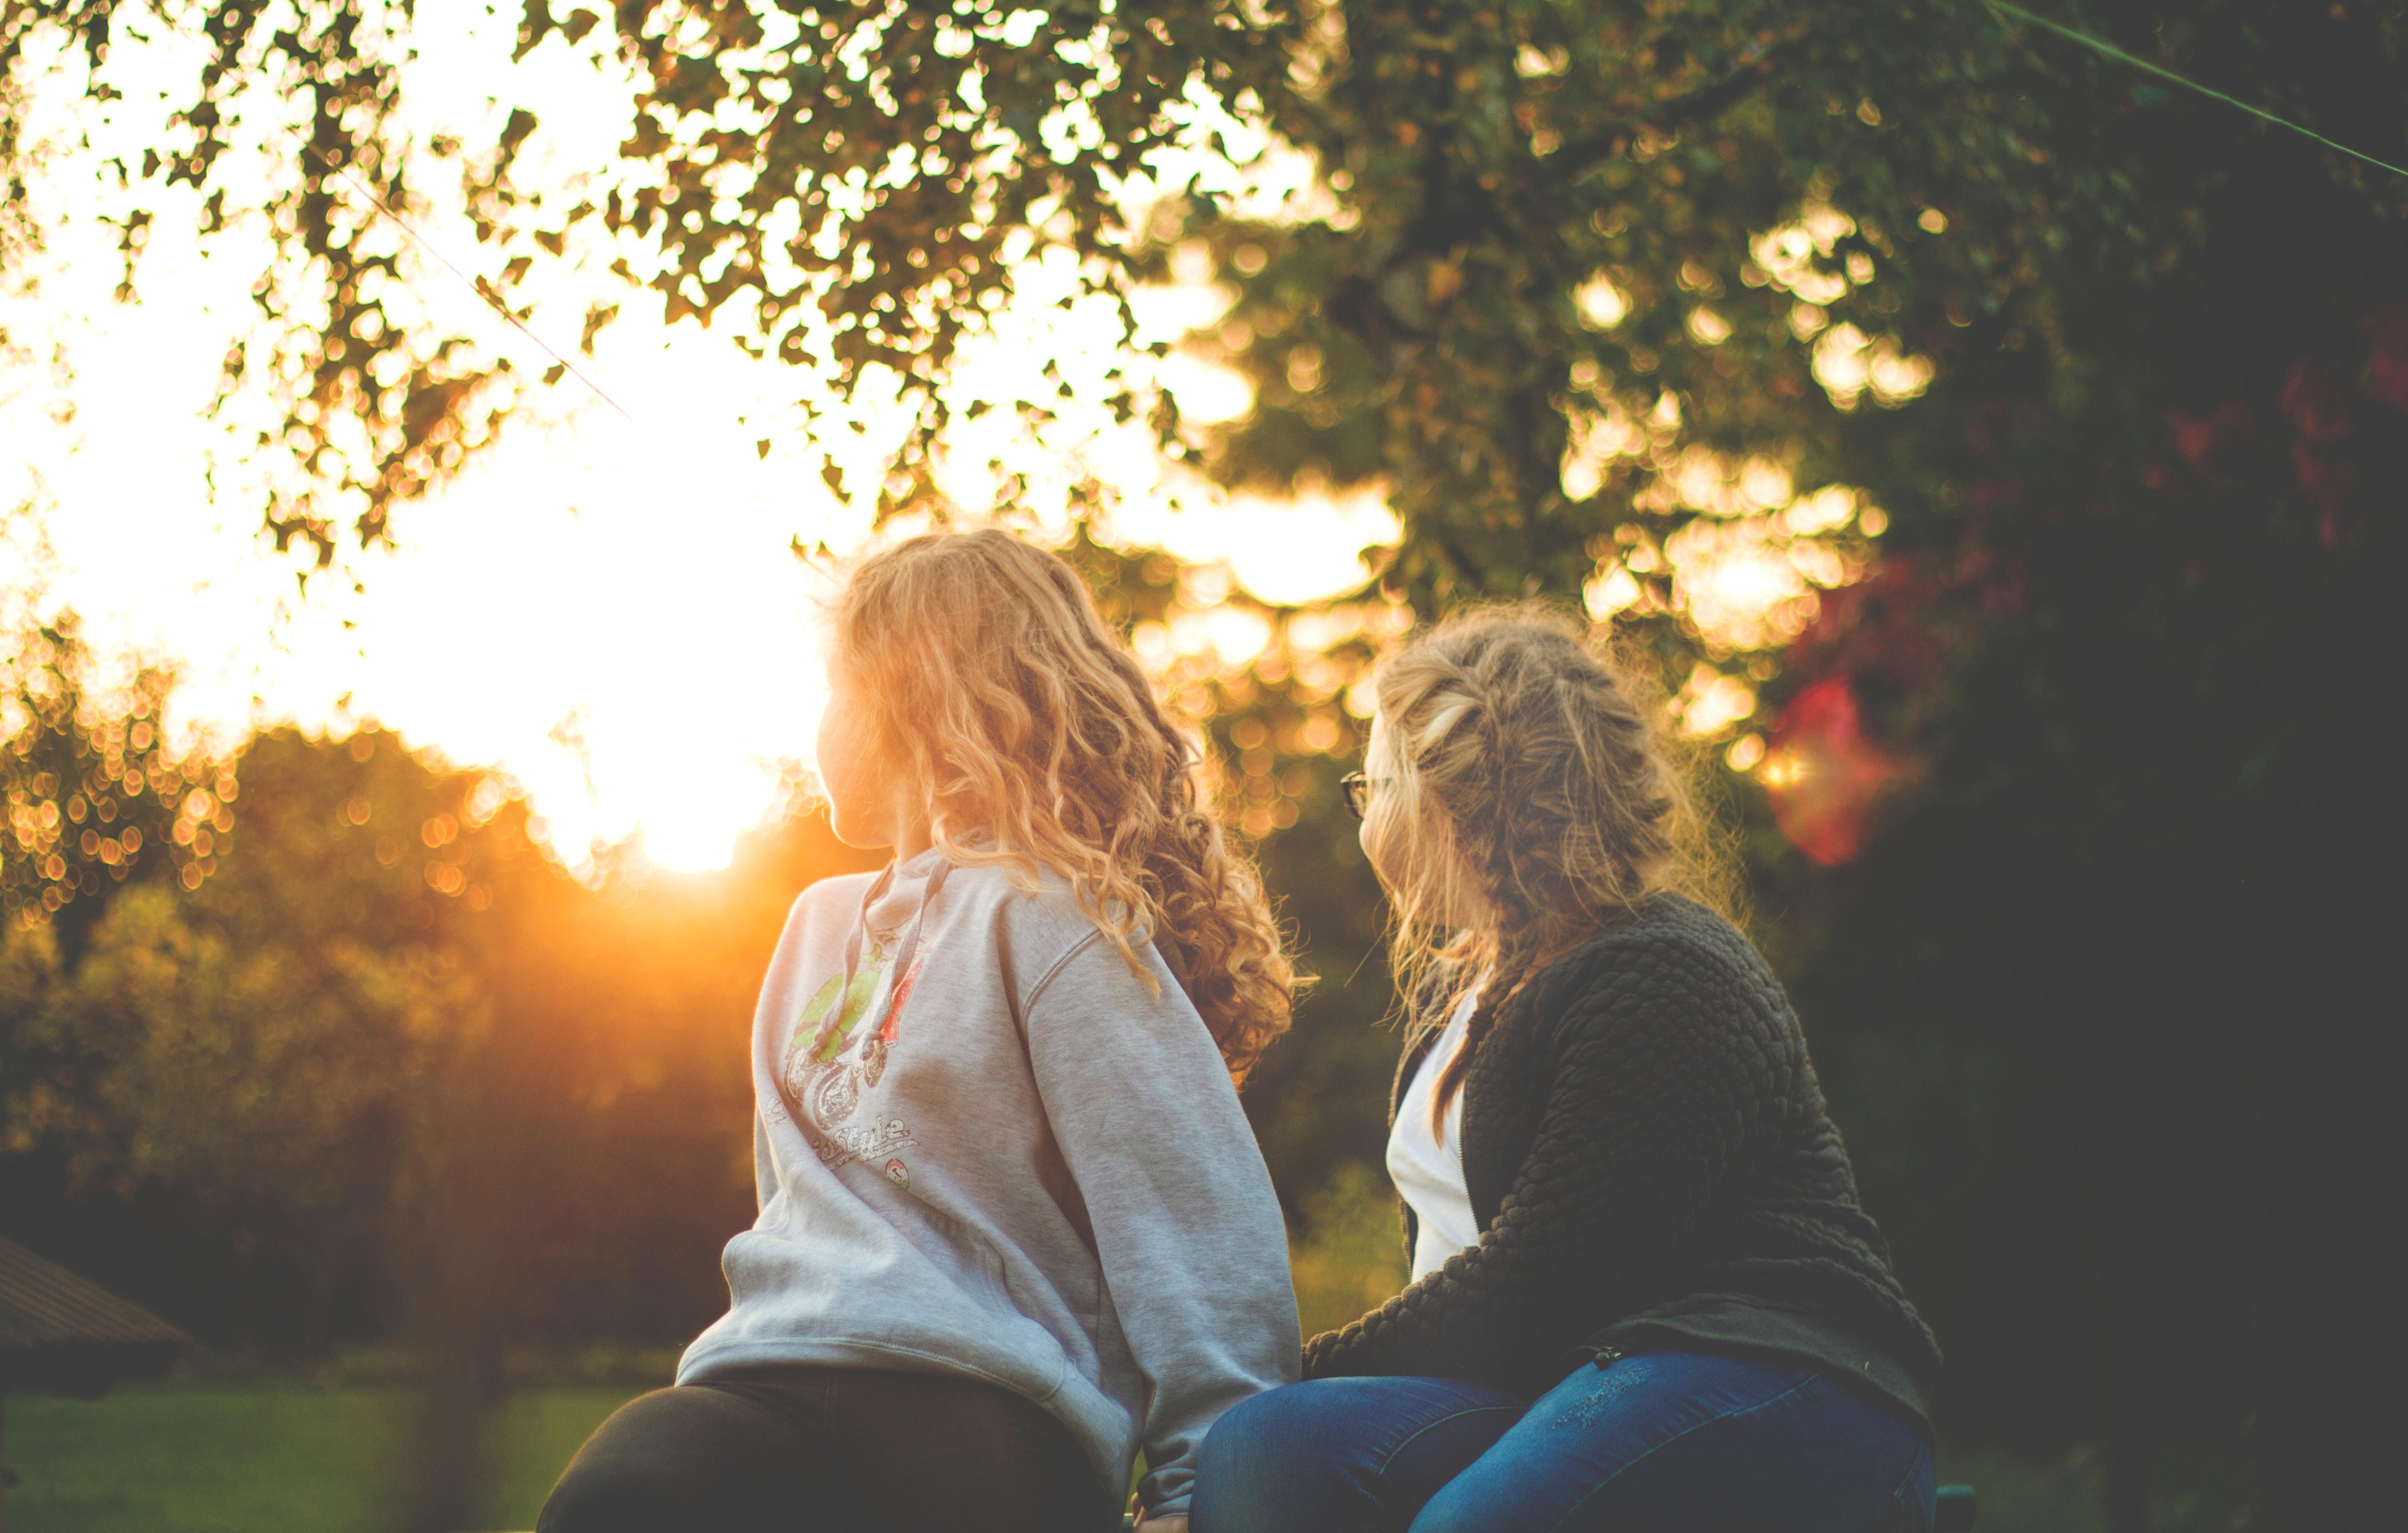 Two women sitting near green tree during sunset photo